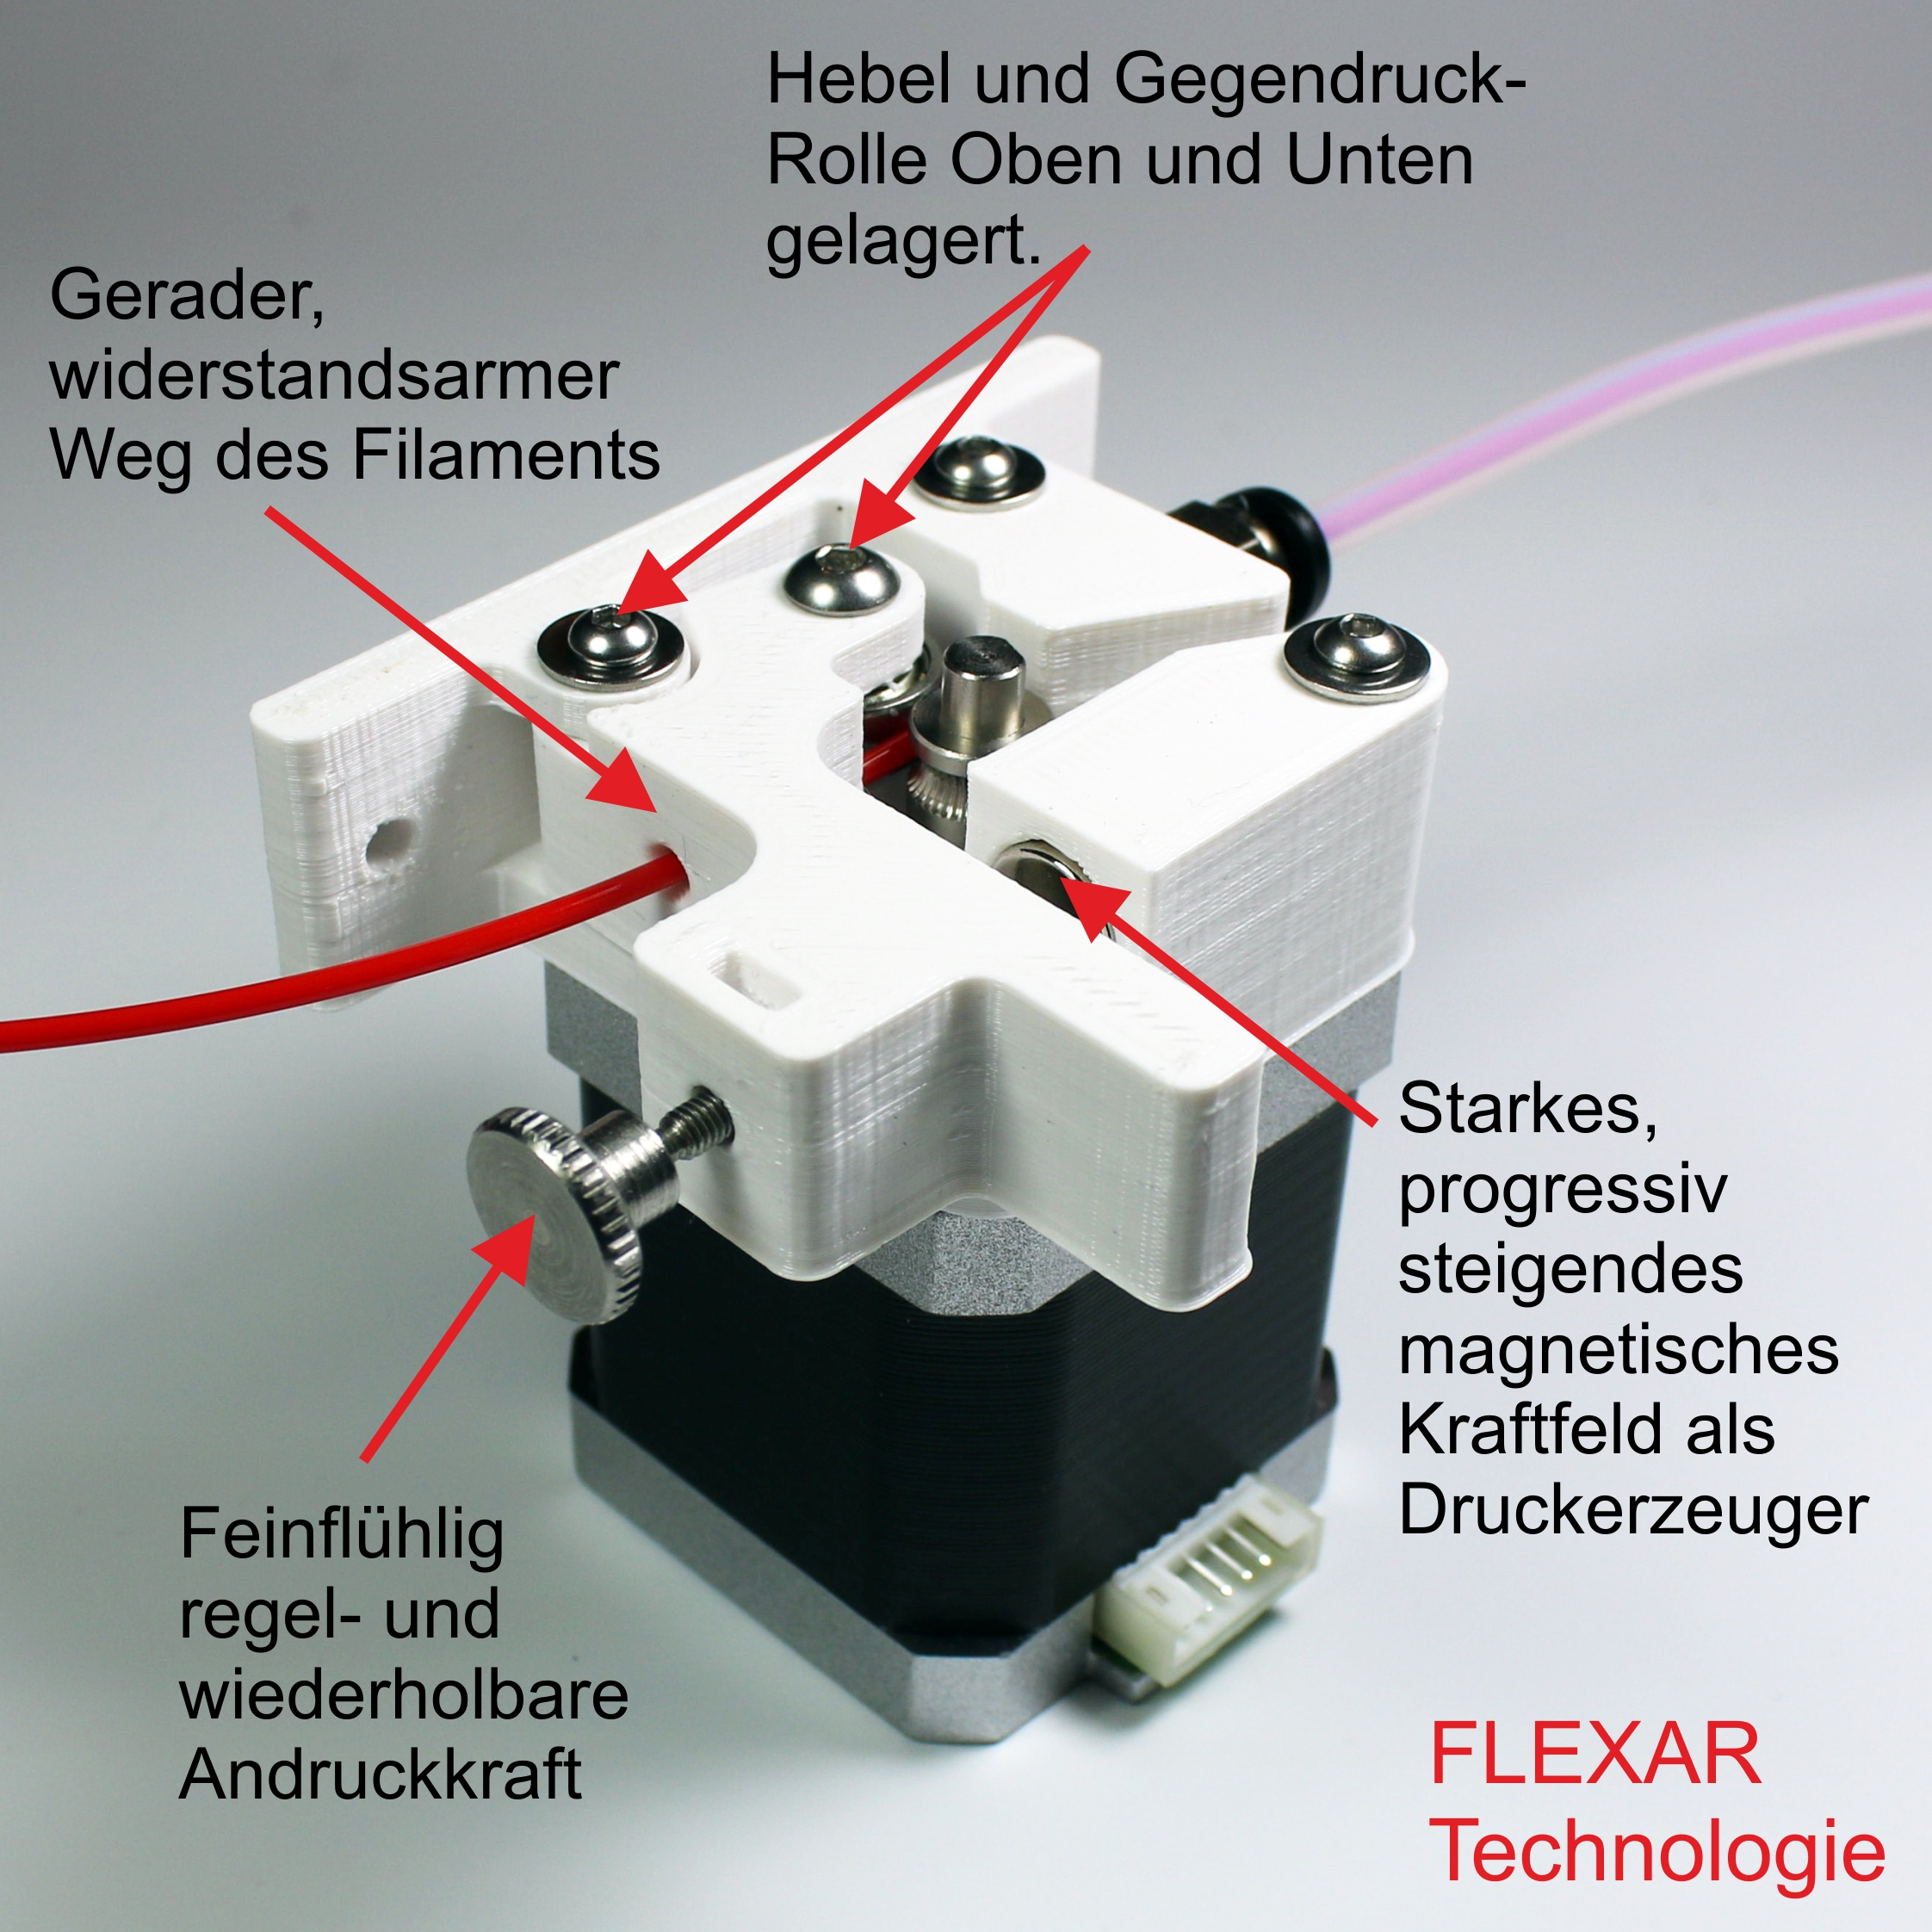 flexar-extruder-eigenschaften-beschrieben-4TM8JzOwe6cR3I